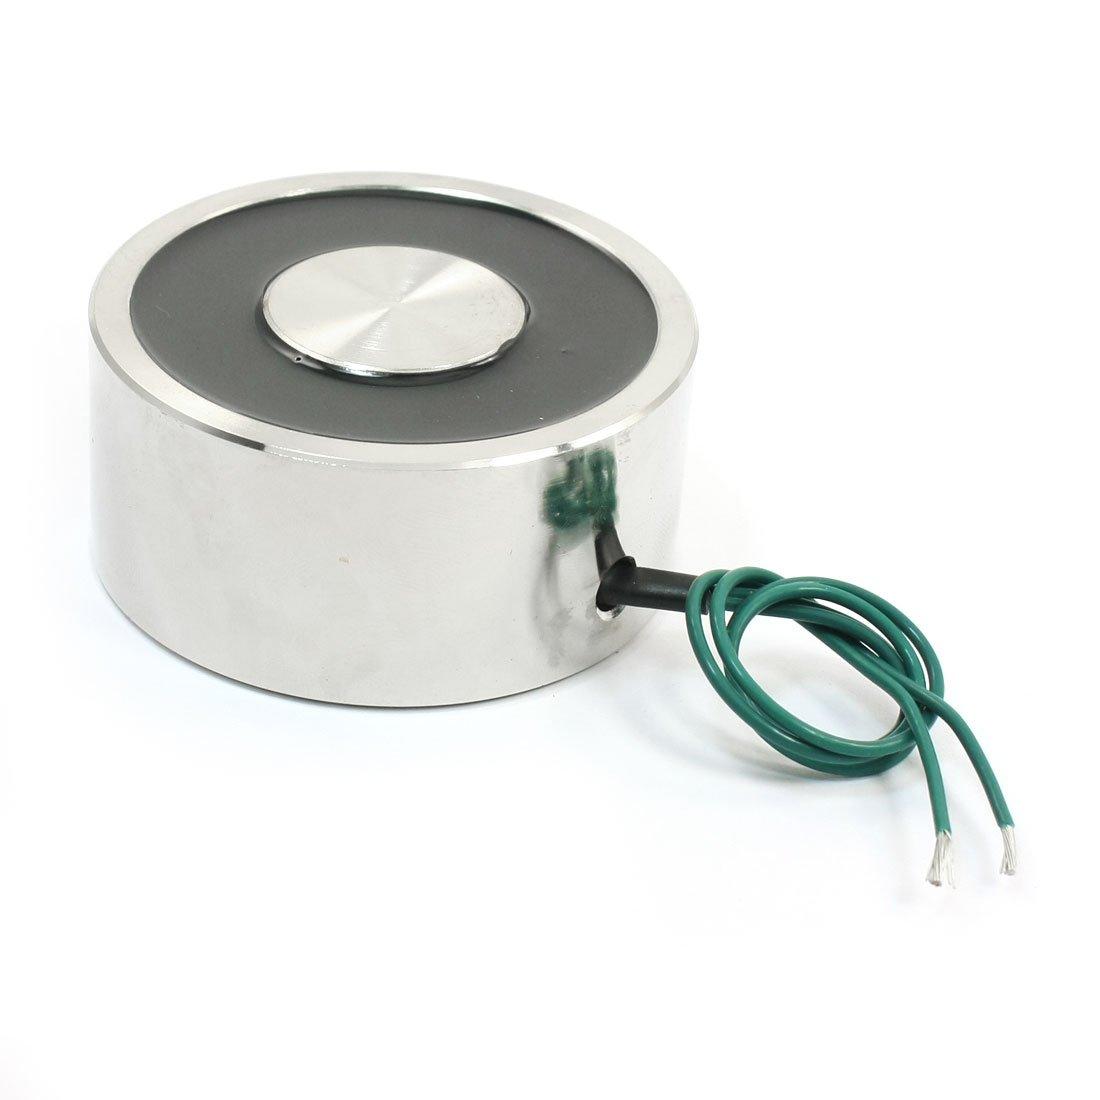 uxcell 80Kg//176Lb 8mm Thread Dia Lifting Magnet Electromagnet Solenoid DC12V